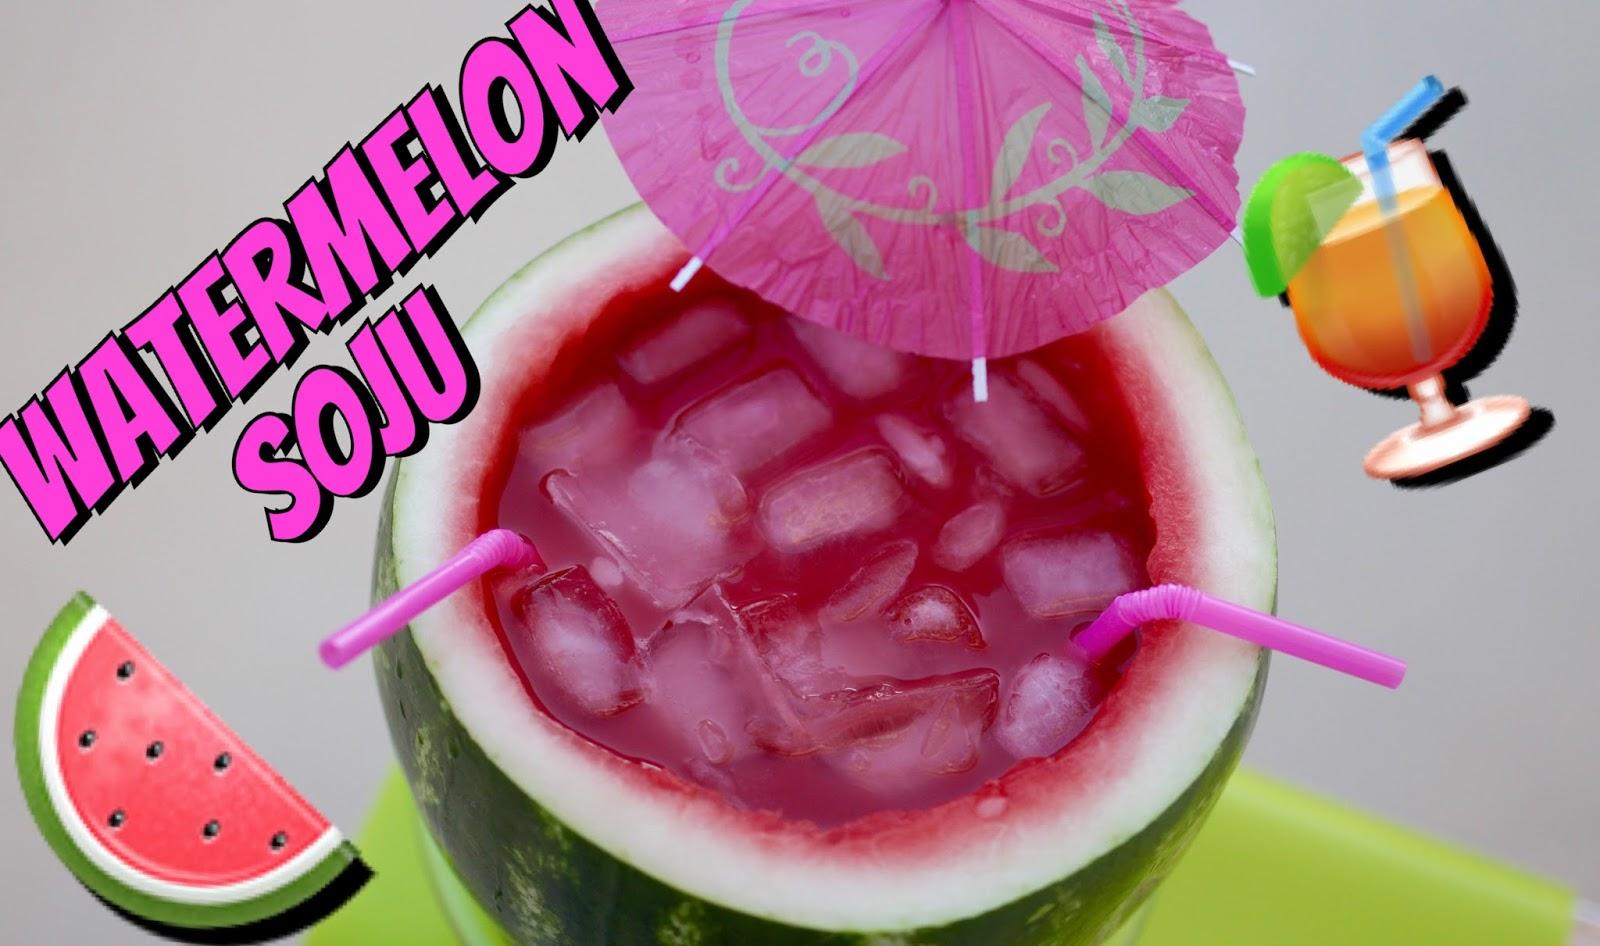 Tin's Bloggin: Watermelon Soju Cocktail Recipe | Twilightchic143